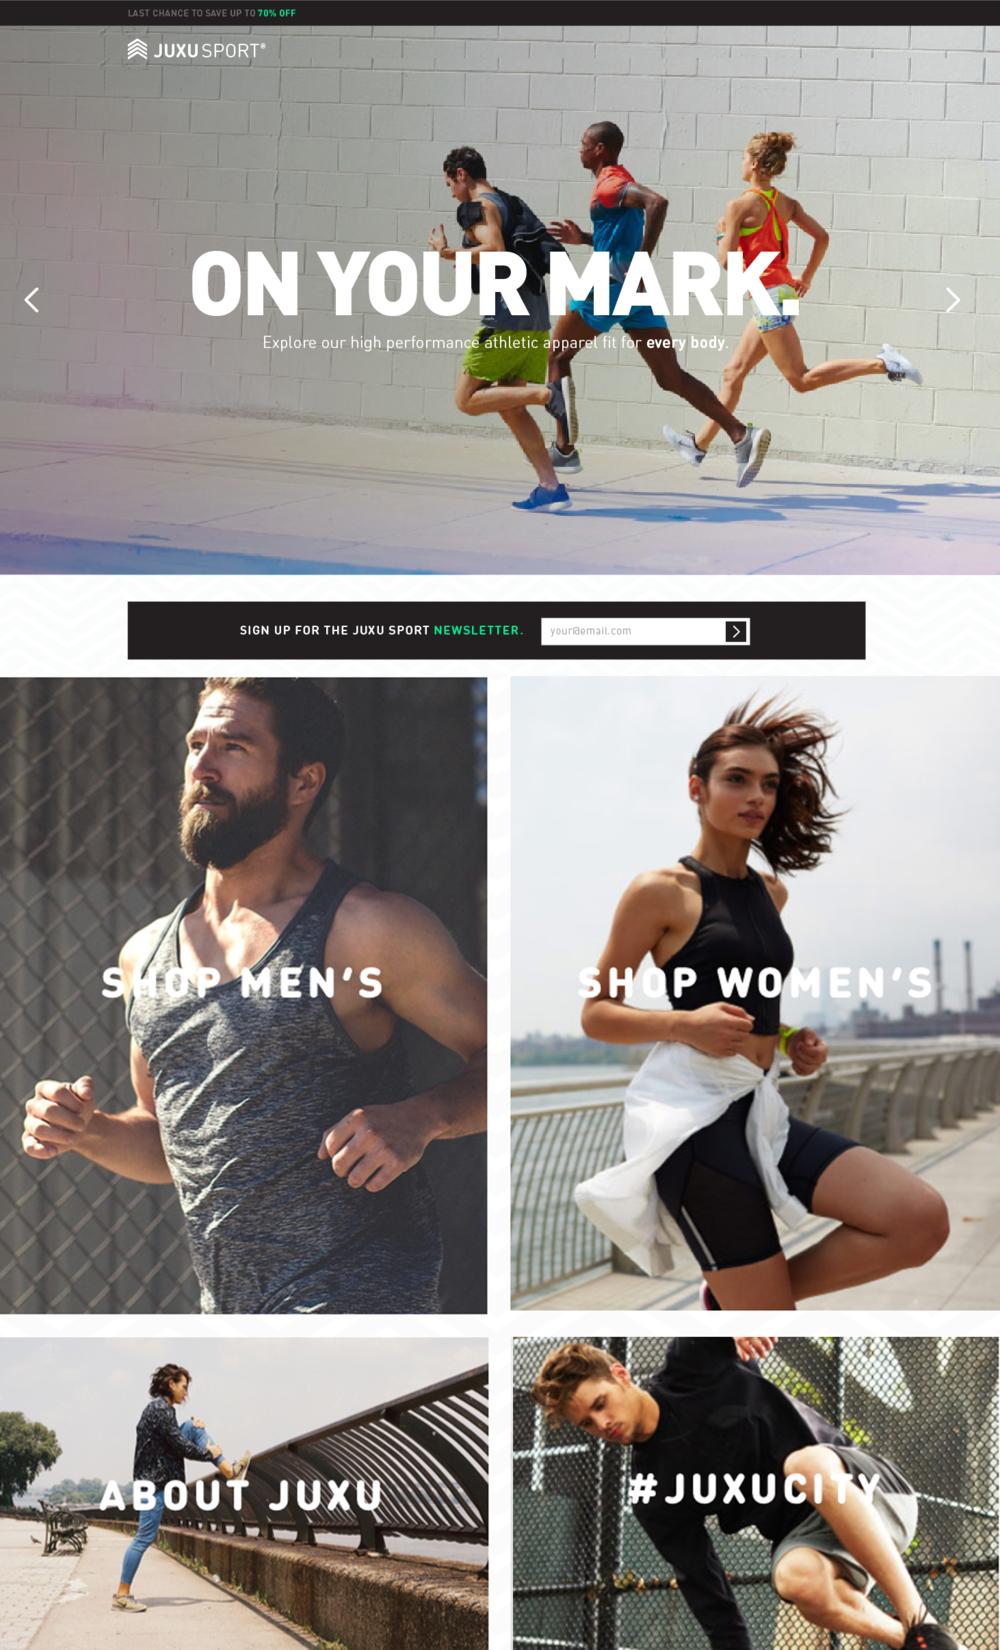 Juxu_Homepage_On+Your+Mark